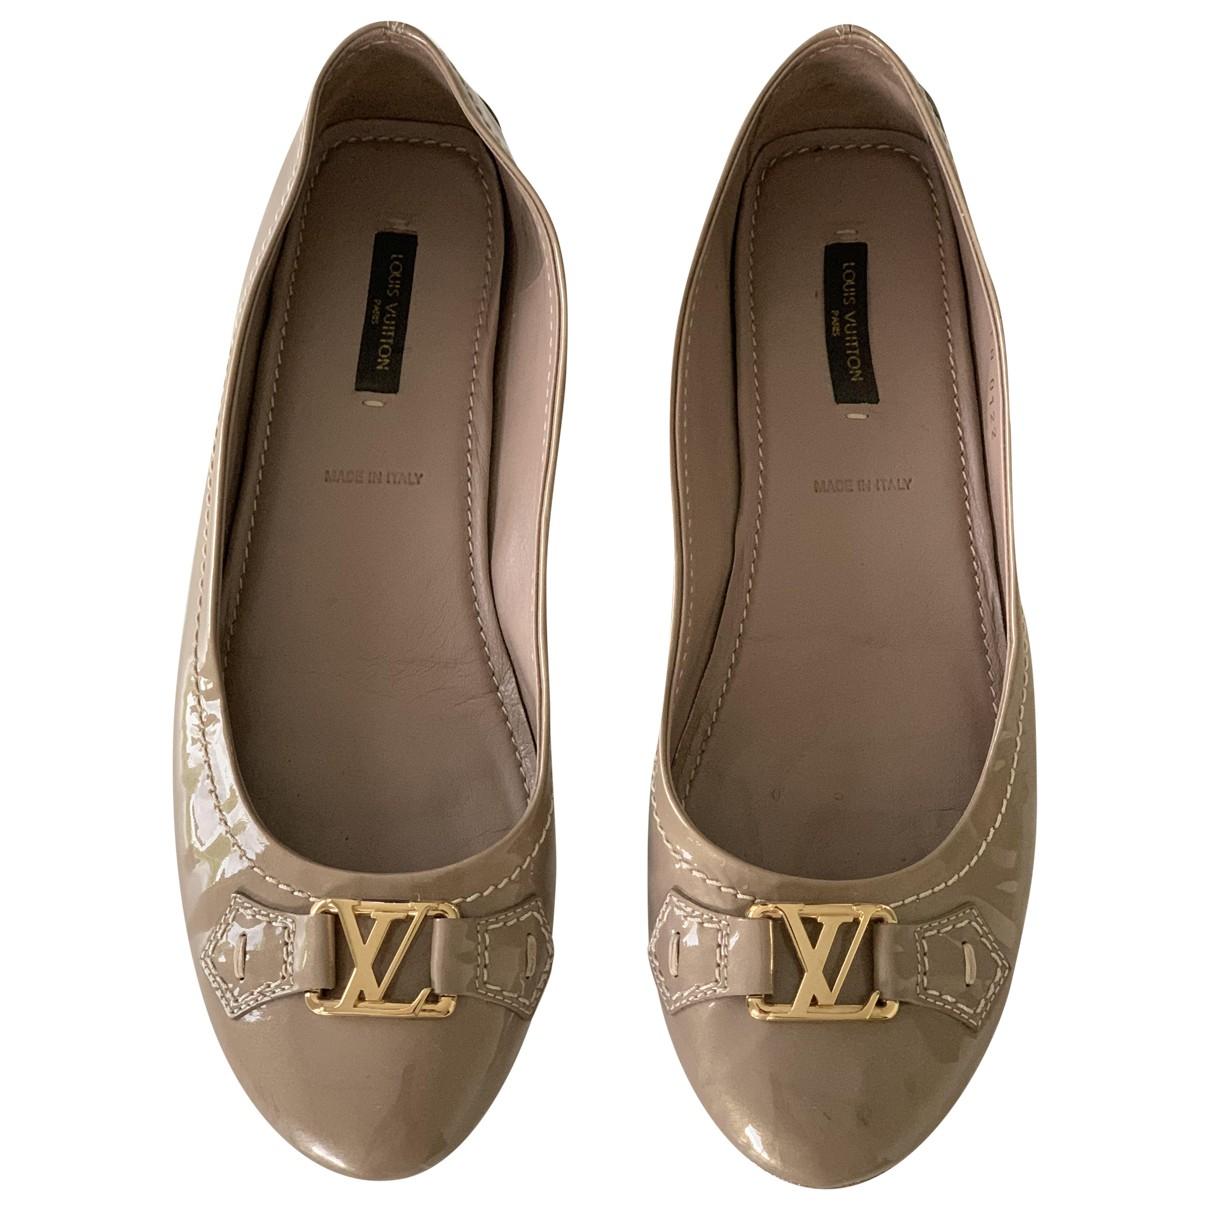 Louis Vuitton \N Beige Patent leather Ballet flats for Women 38.5 EU